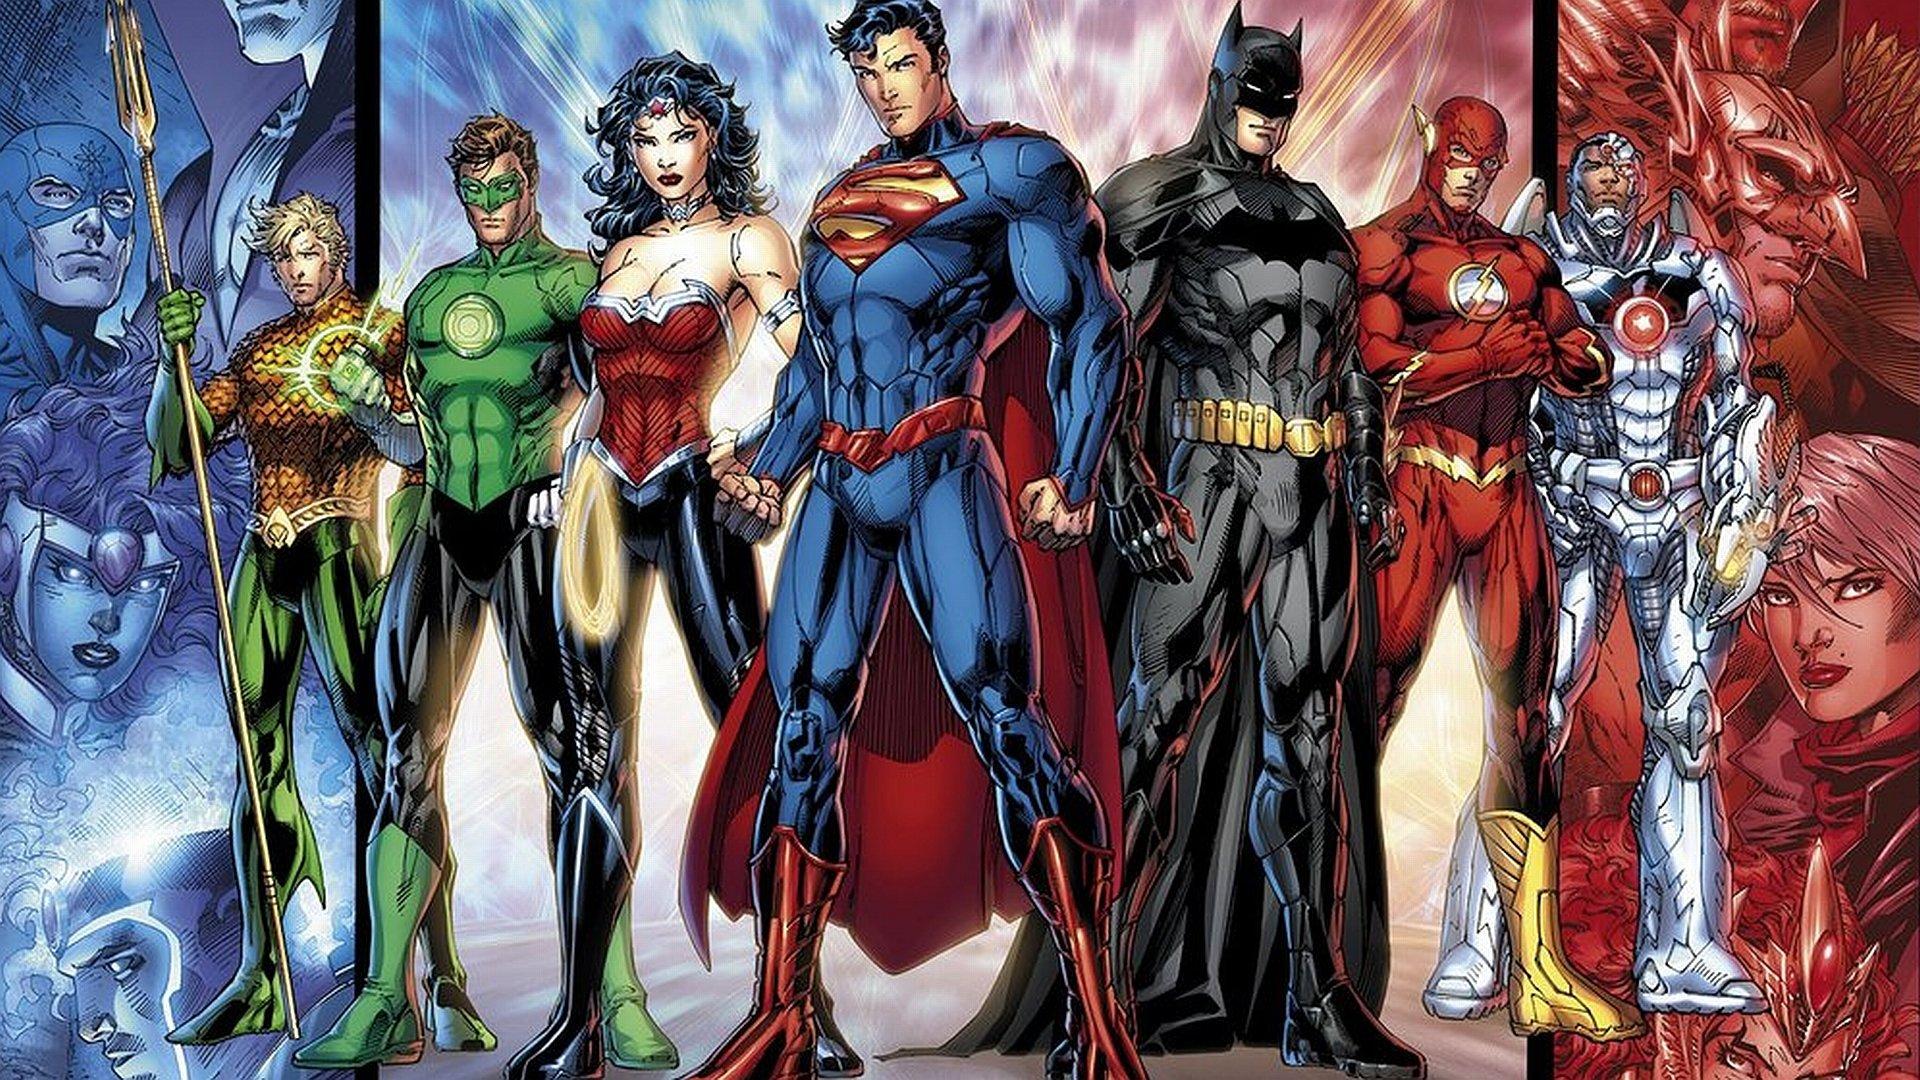 Justice League Wallpaper HD 1080p HD Desktop Wallpapers 1920x1080